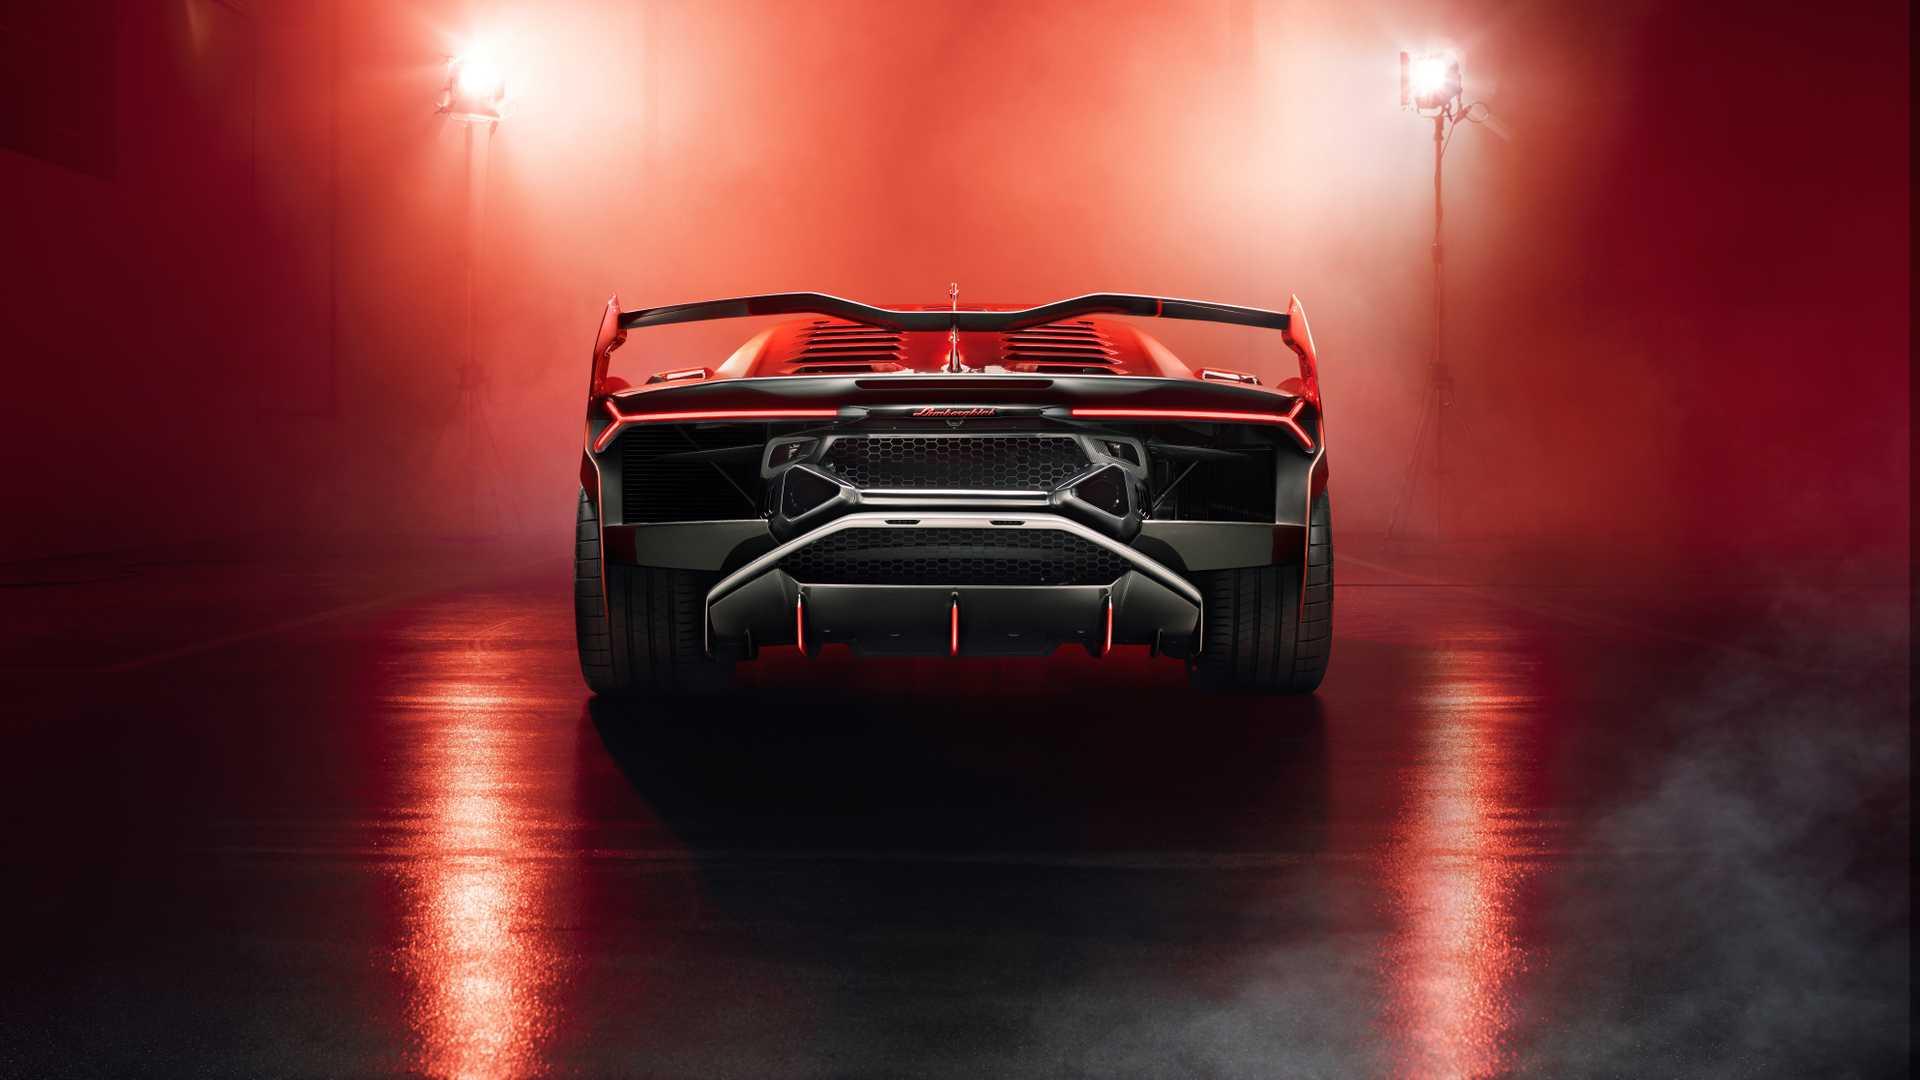 Carlos Ghosn Misconduct Lamborghini Sc18 Jeep Trackhawk Recall